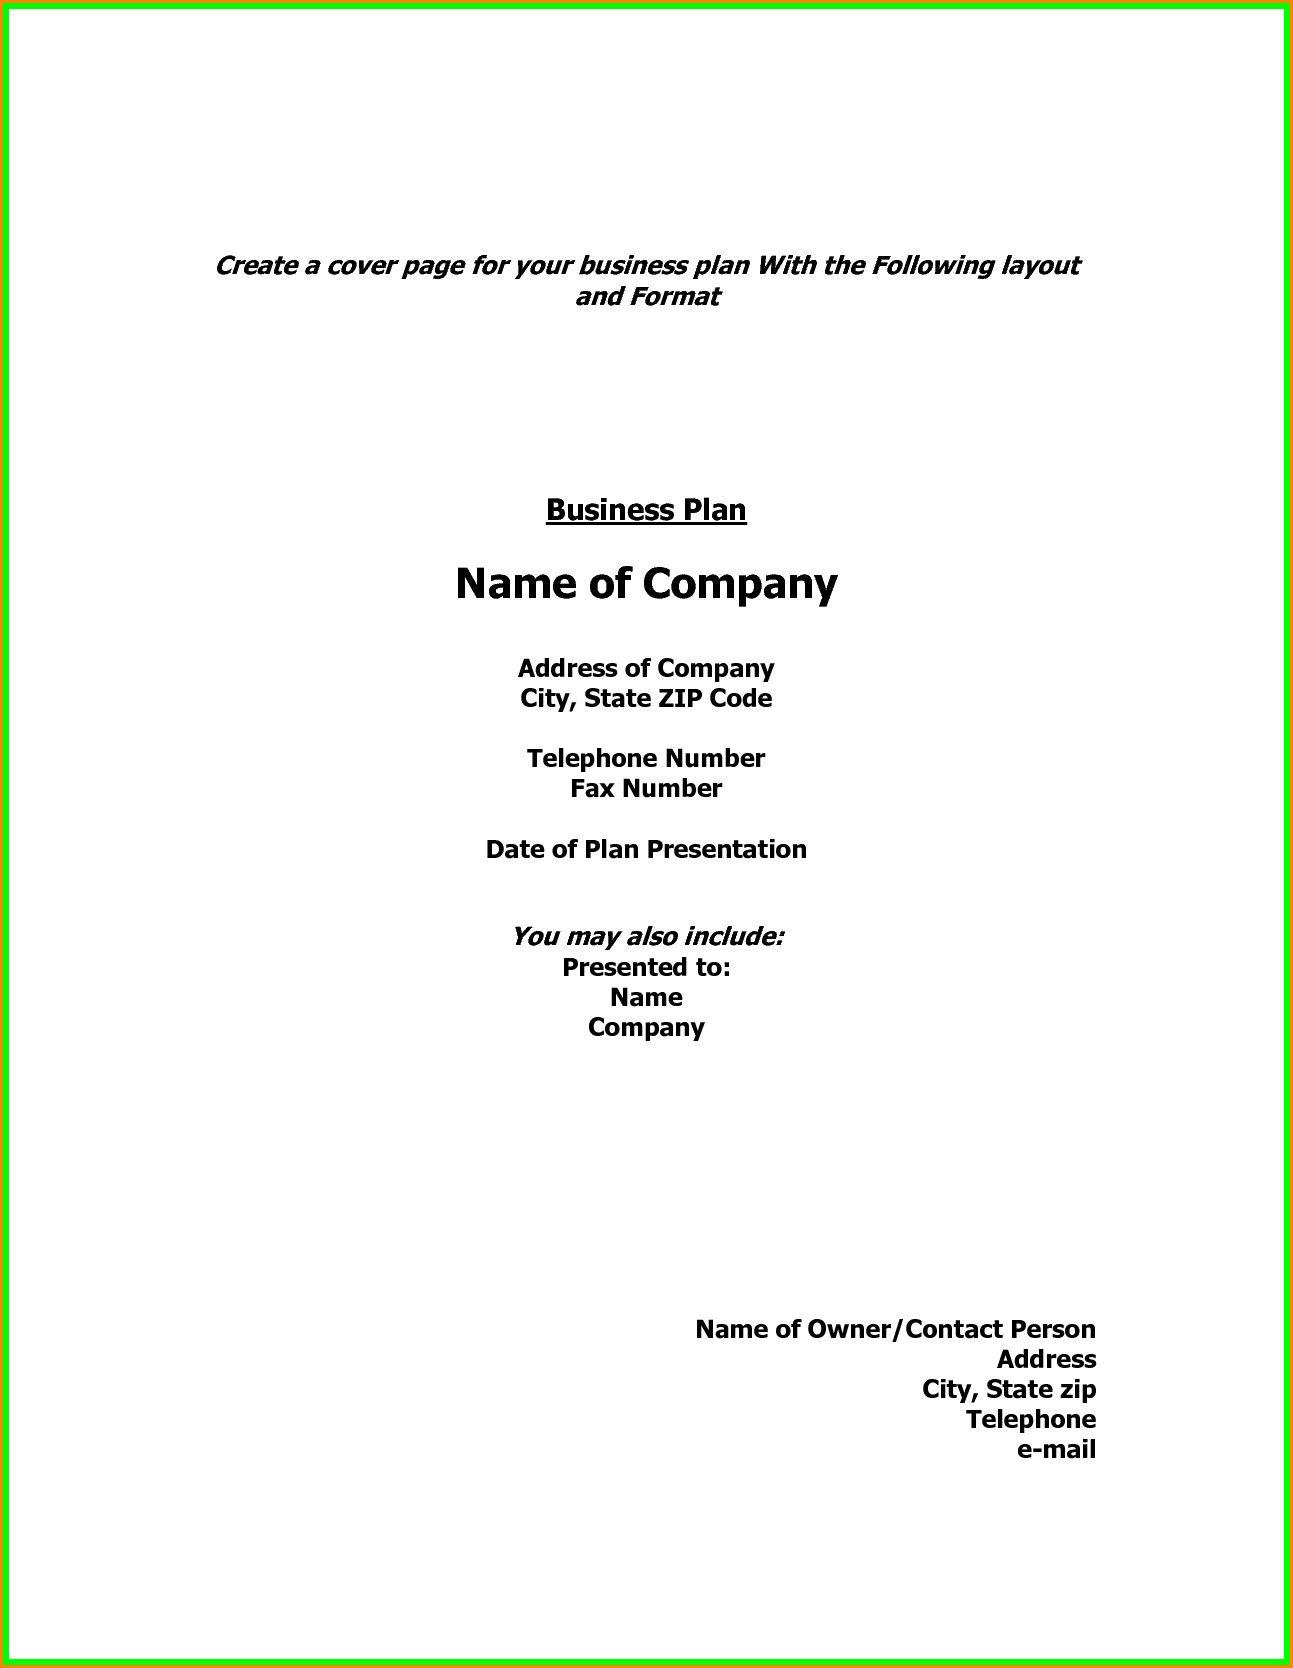 Business Plan Cover Page Template Unique Show Example Cover Page Business Plan Ver Lette Cover Page Template Cover Letter For Resume Business Proposal Template Business proposal cover page template